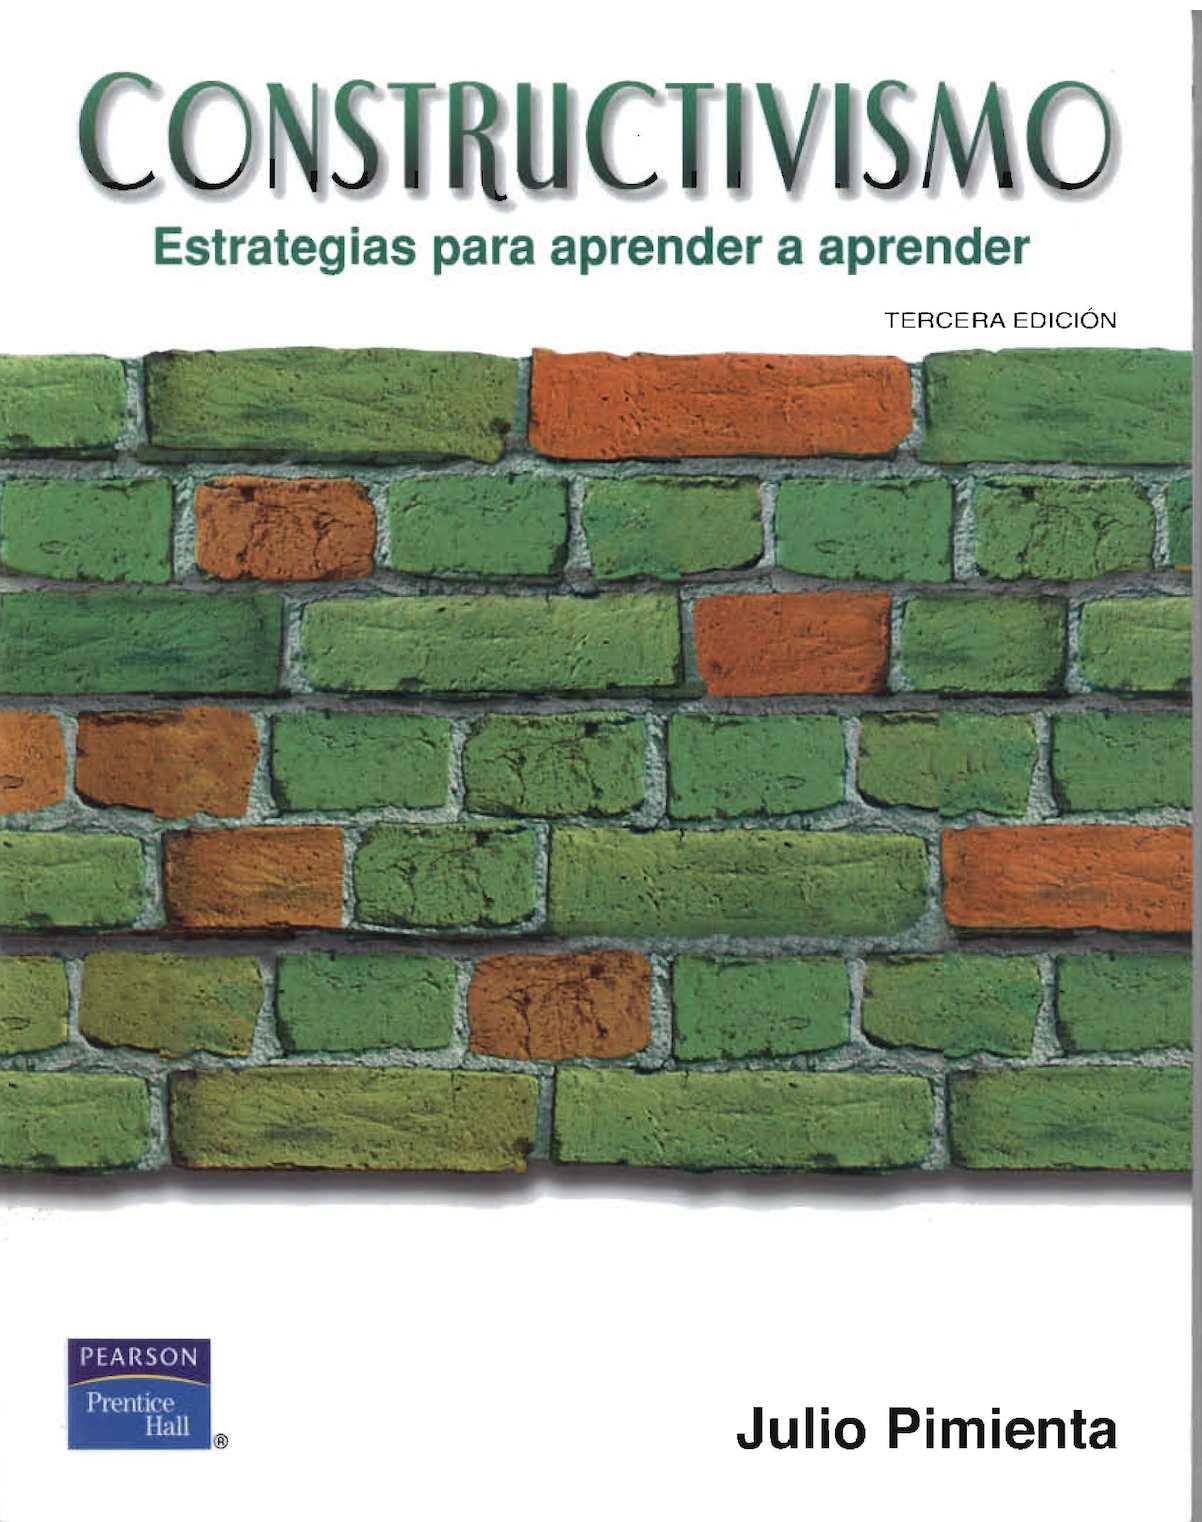 Libro Constructivismo Estrategias Para Aprender A Aprender (1)